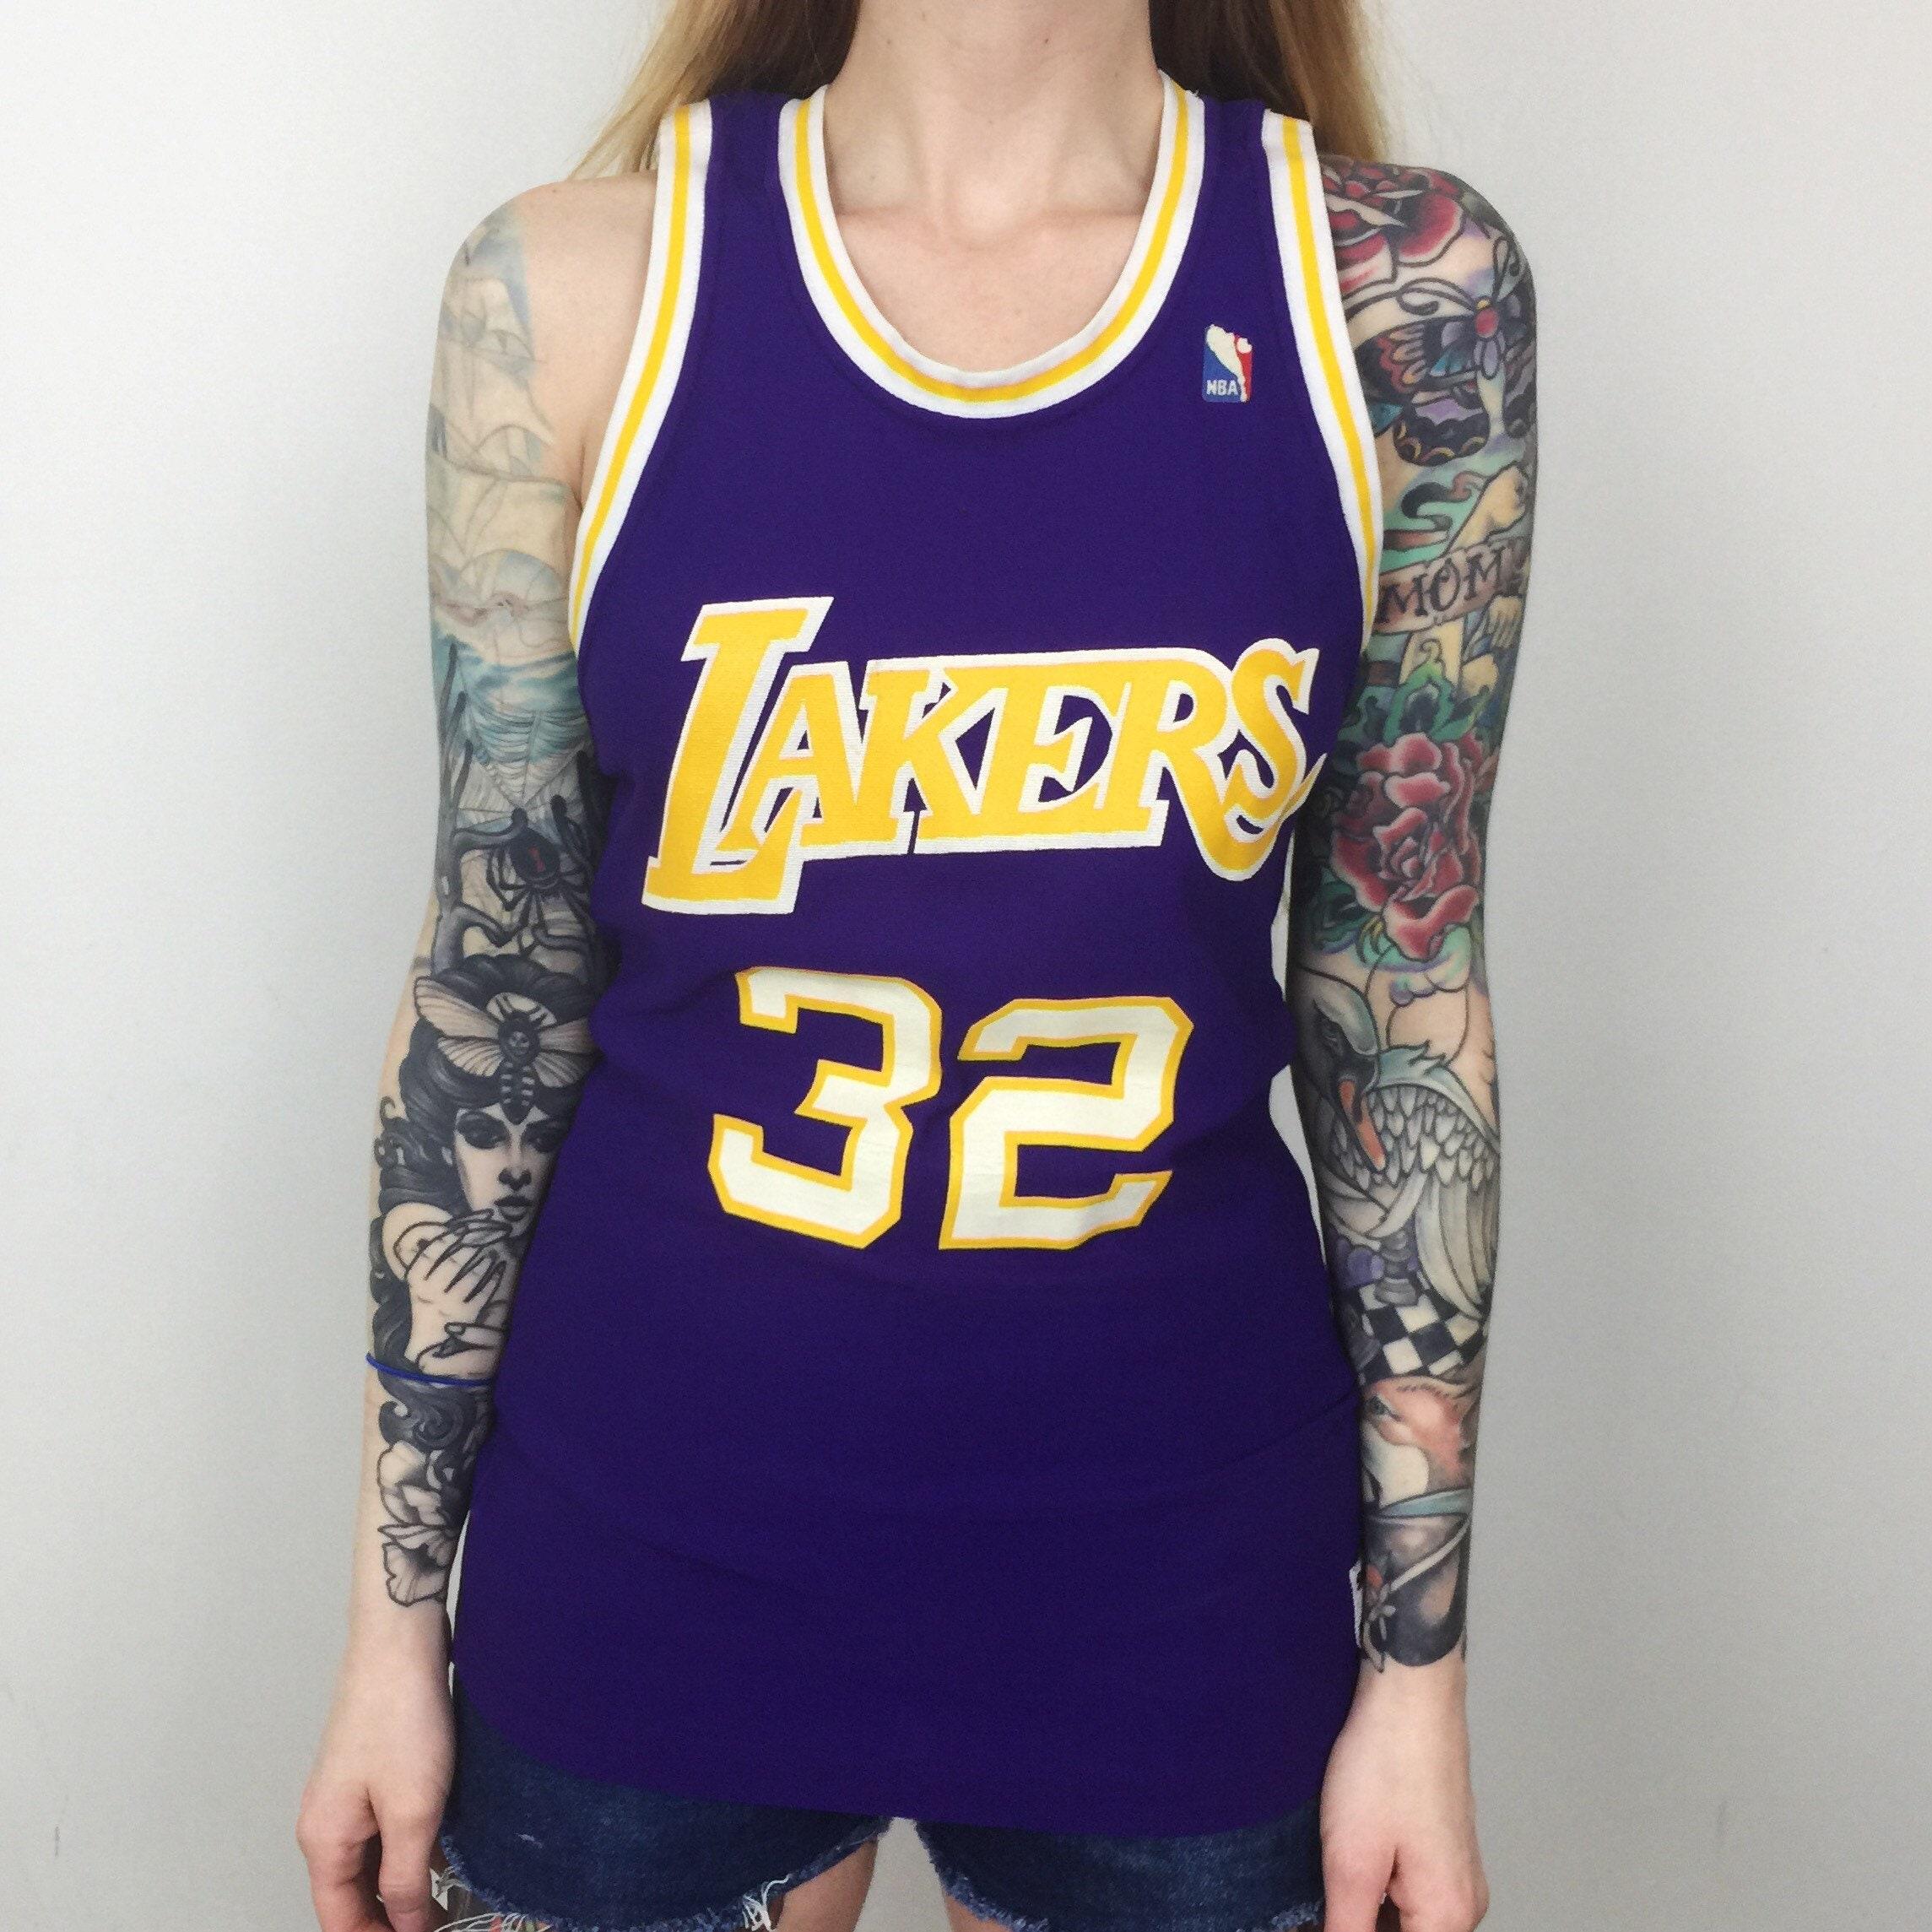 33aec5930 Rare Vintage 80s NBA LA Los Angeles Lakers Magic Johnson  32 purple  MacGregor Sand Knit basketball jersey - Size S